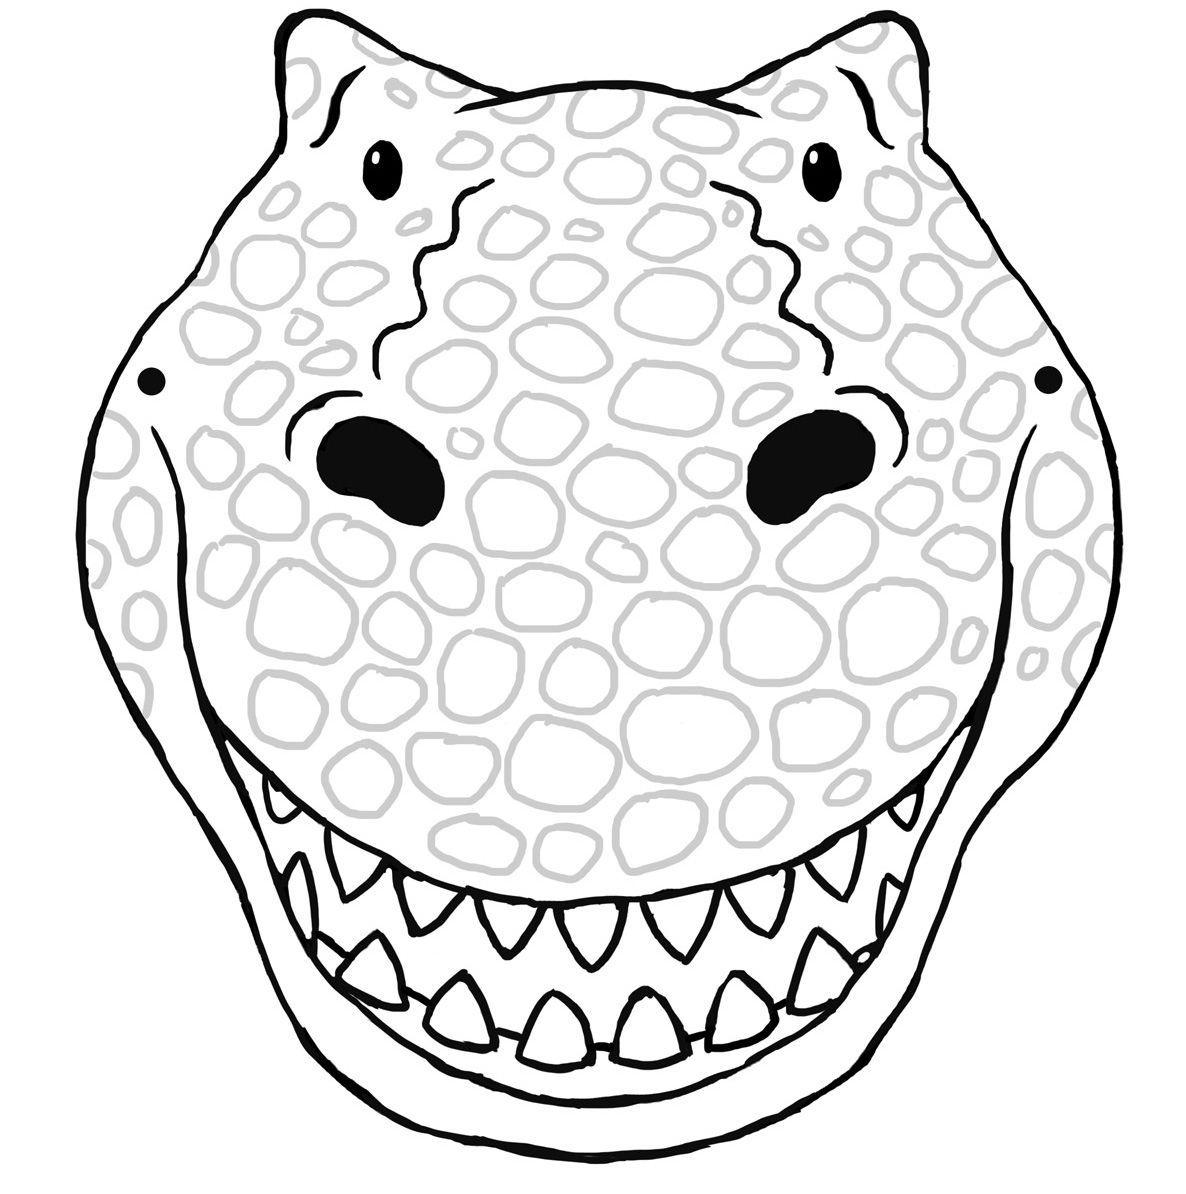 Dinosaur Mask Template Print - NextInvitation Templates | dinasuars ...